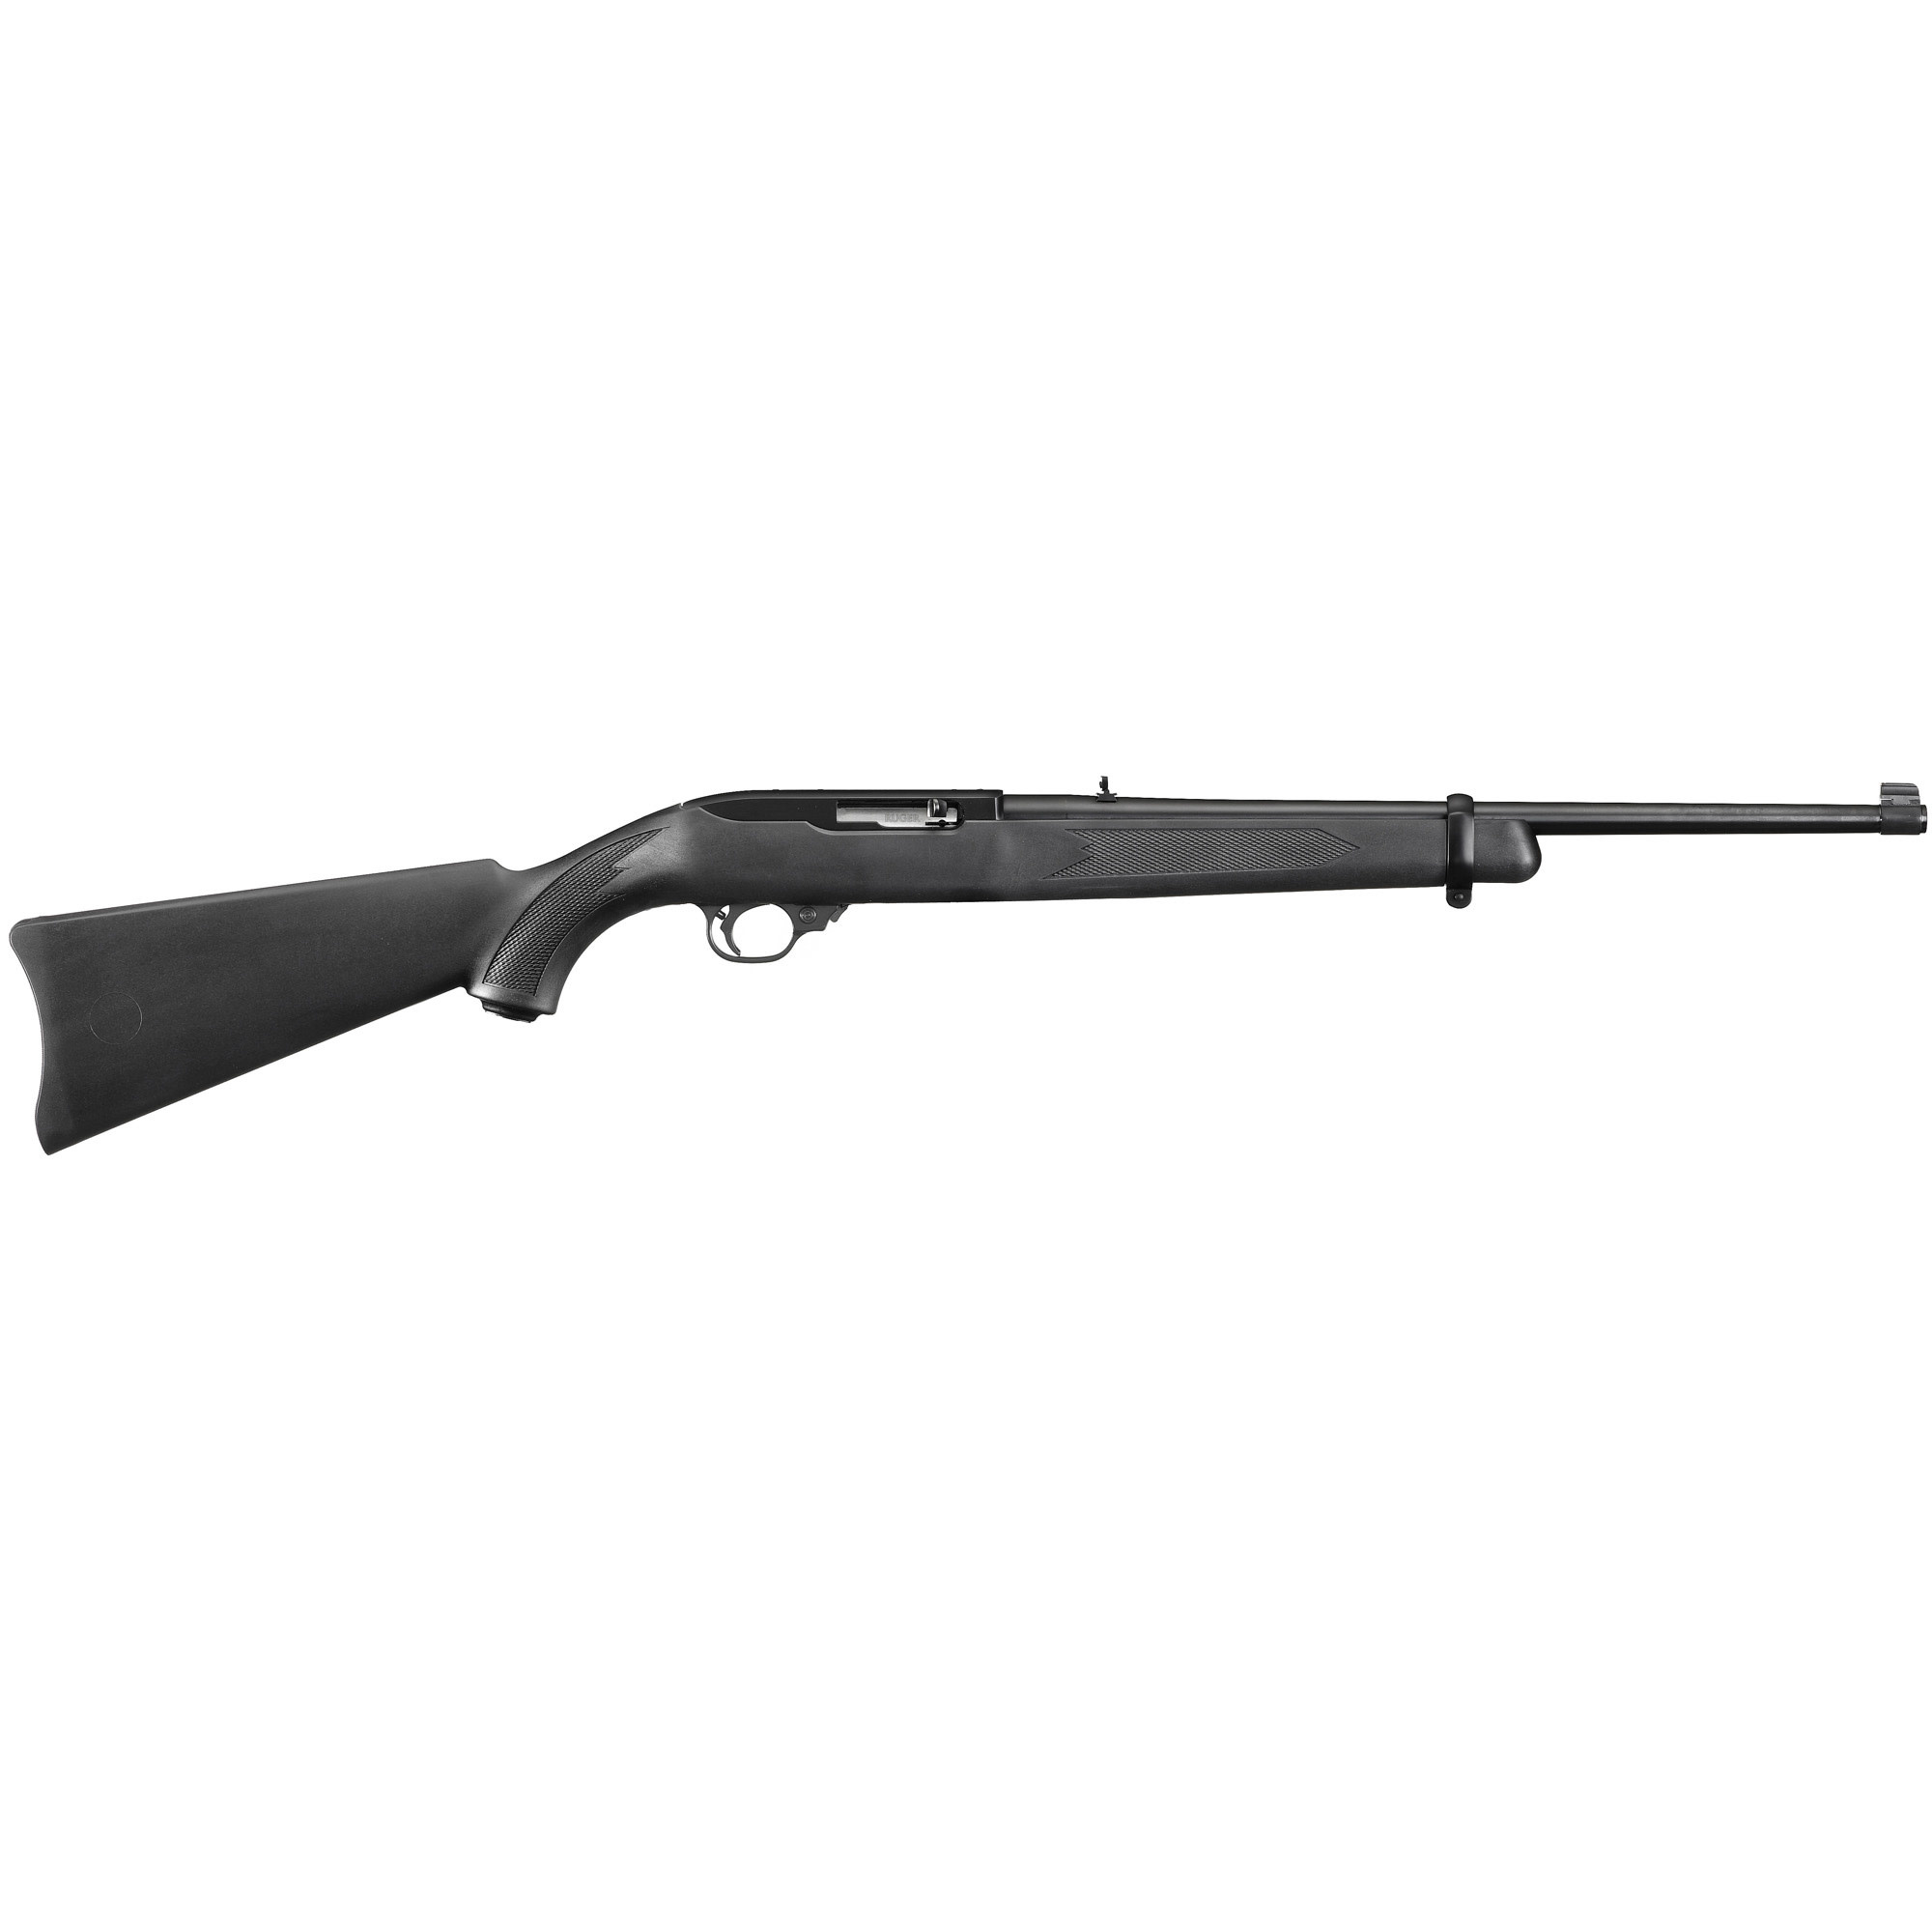 "Ruger 10/22 Carbine Semi-Auto 22LR 18.5"" 10+1 Blk Syn Stock Black Finish"